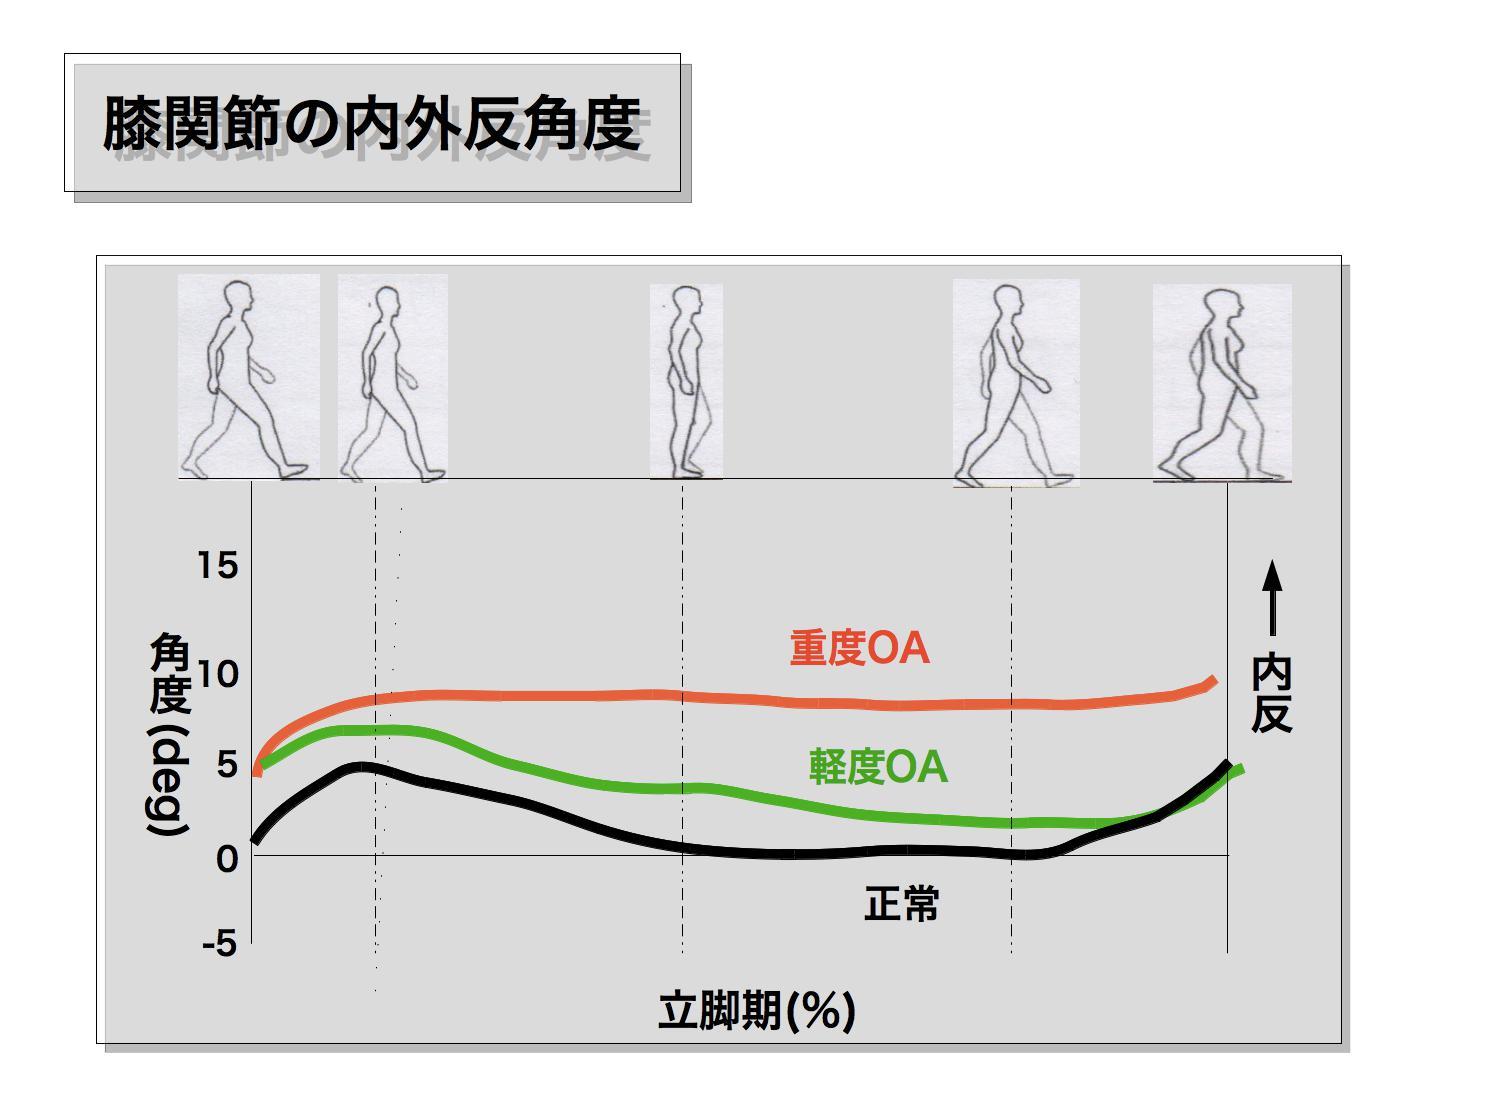 変形性膝関節症の歩行